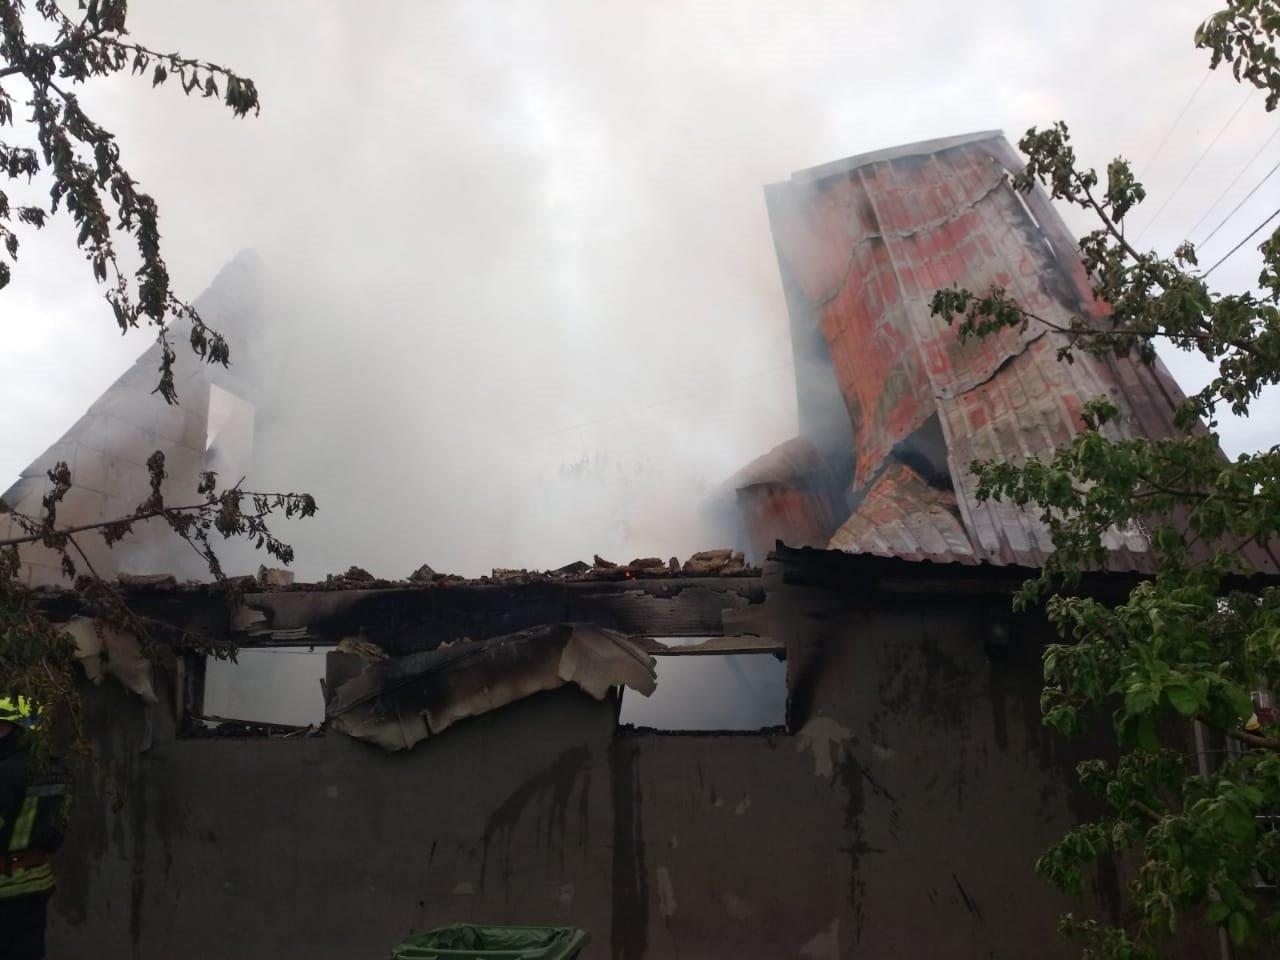 На Днепропетровщине произошел пожар на территории садового общества, - ФОТО, фото-1